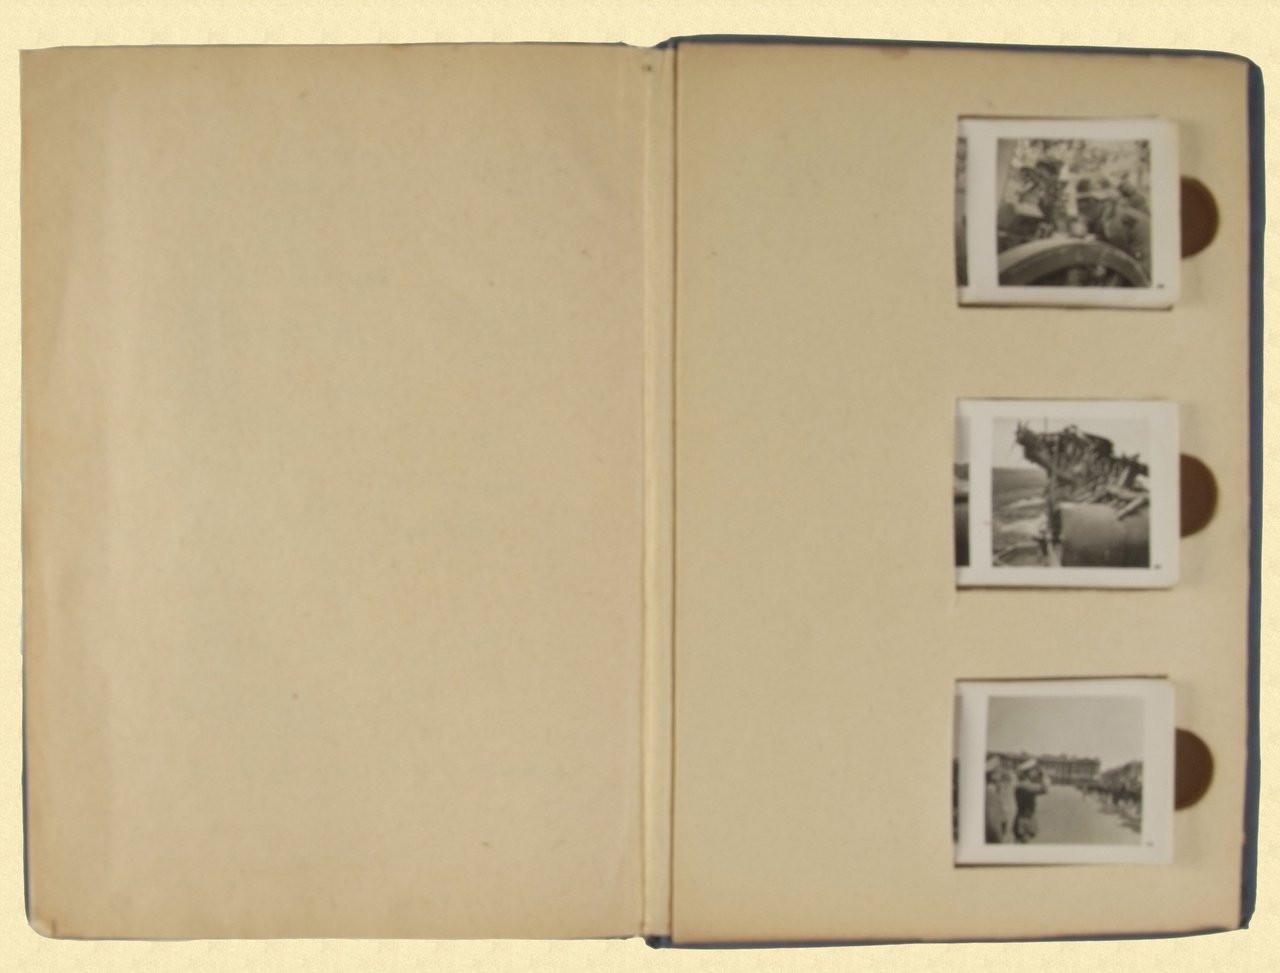 GERMAN WW2 STEREO BOOK - C11193